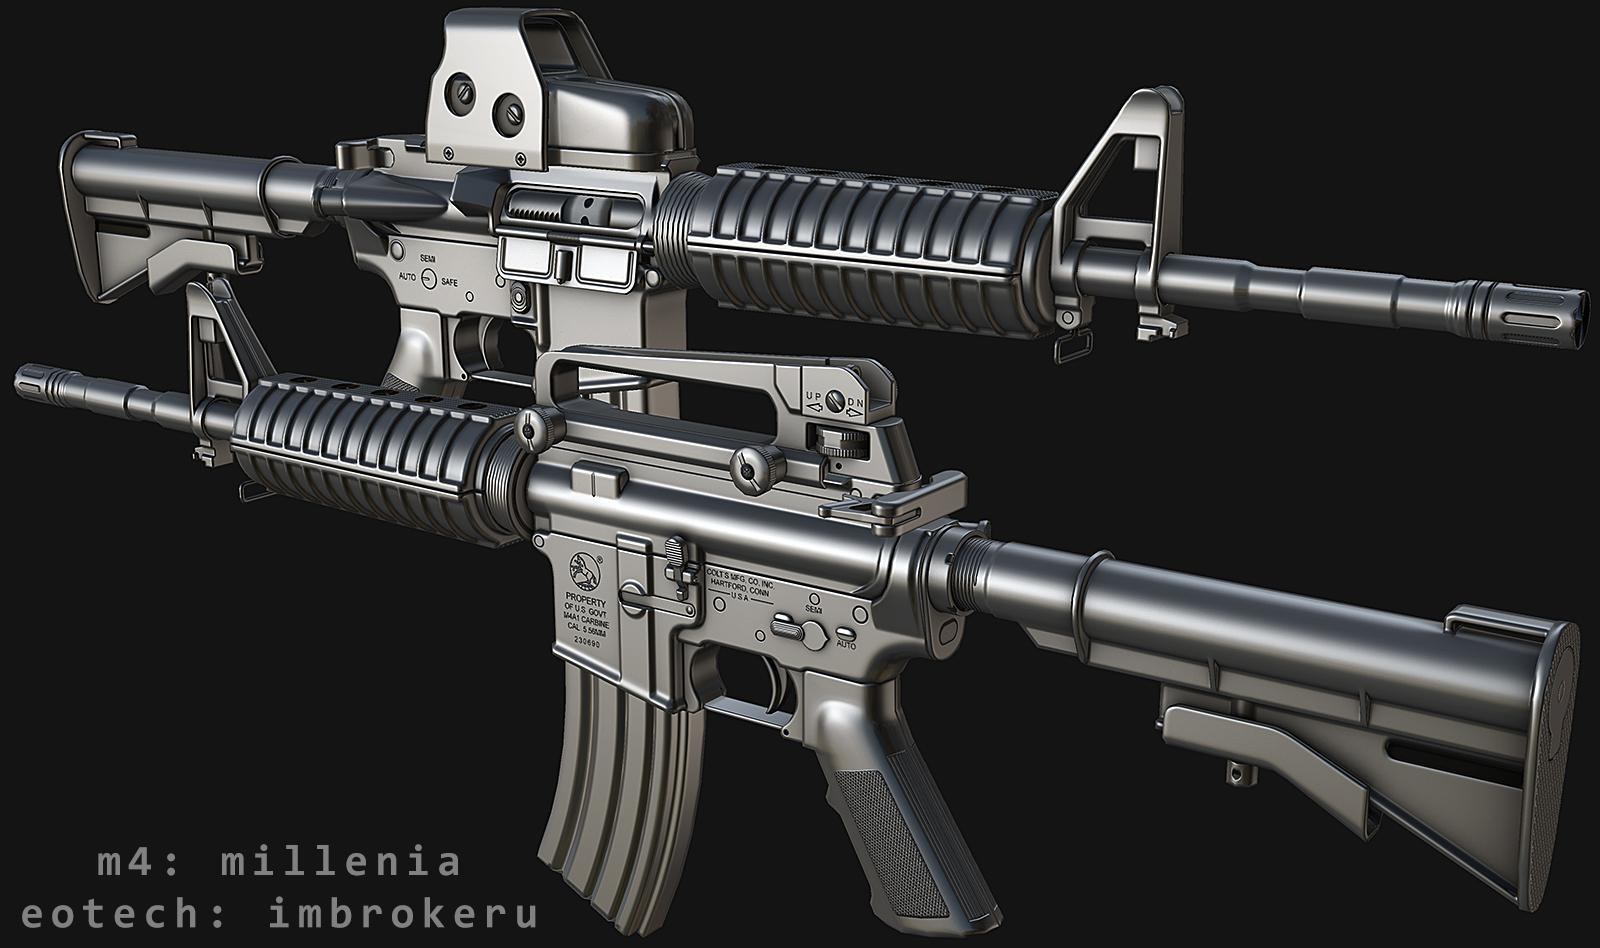 FN FNC model image - L.U.R.K. mod for S.T.A.L.K.E.R